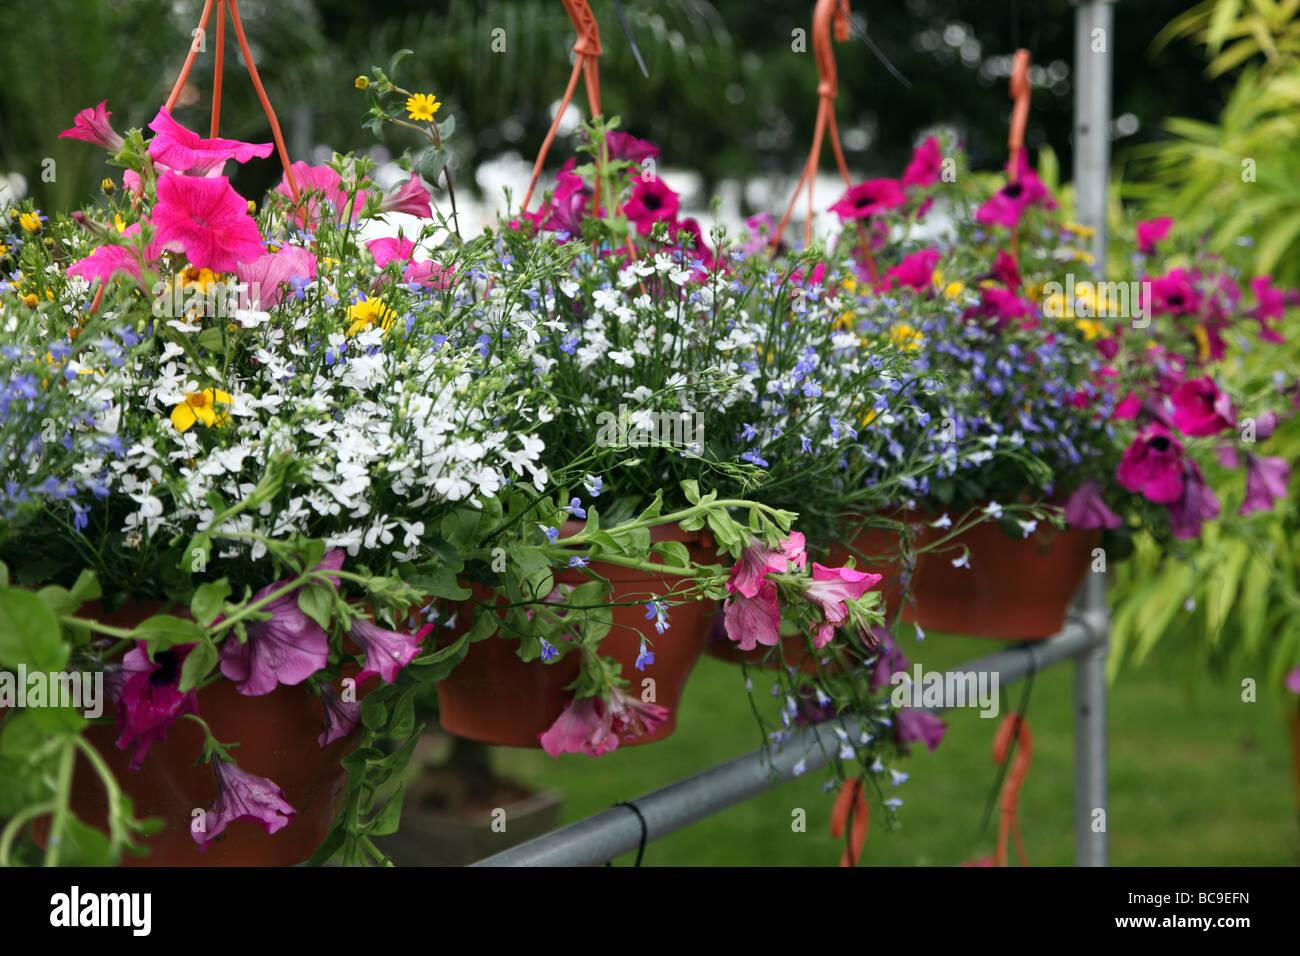 Hanging baskets at Bloom 2009 Ireland s top garden show - Stock Image